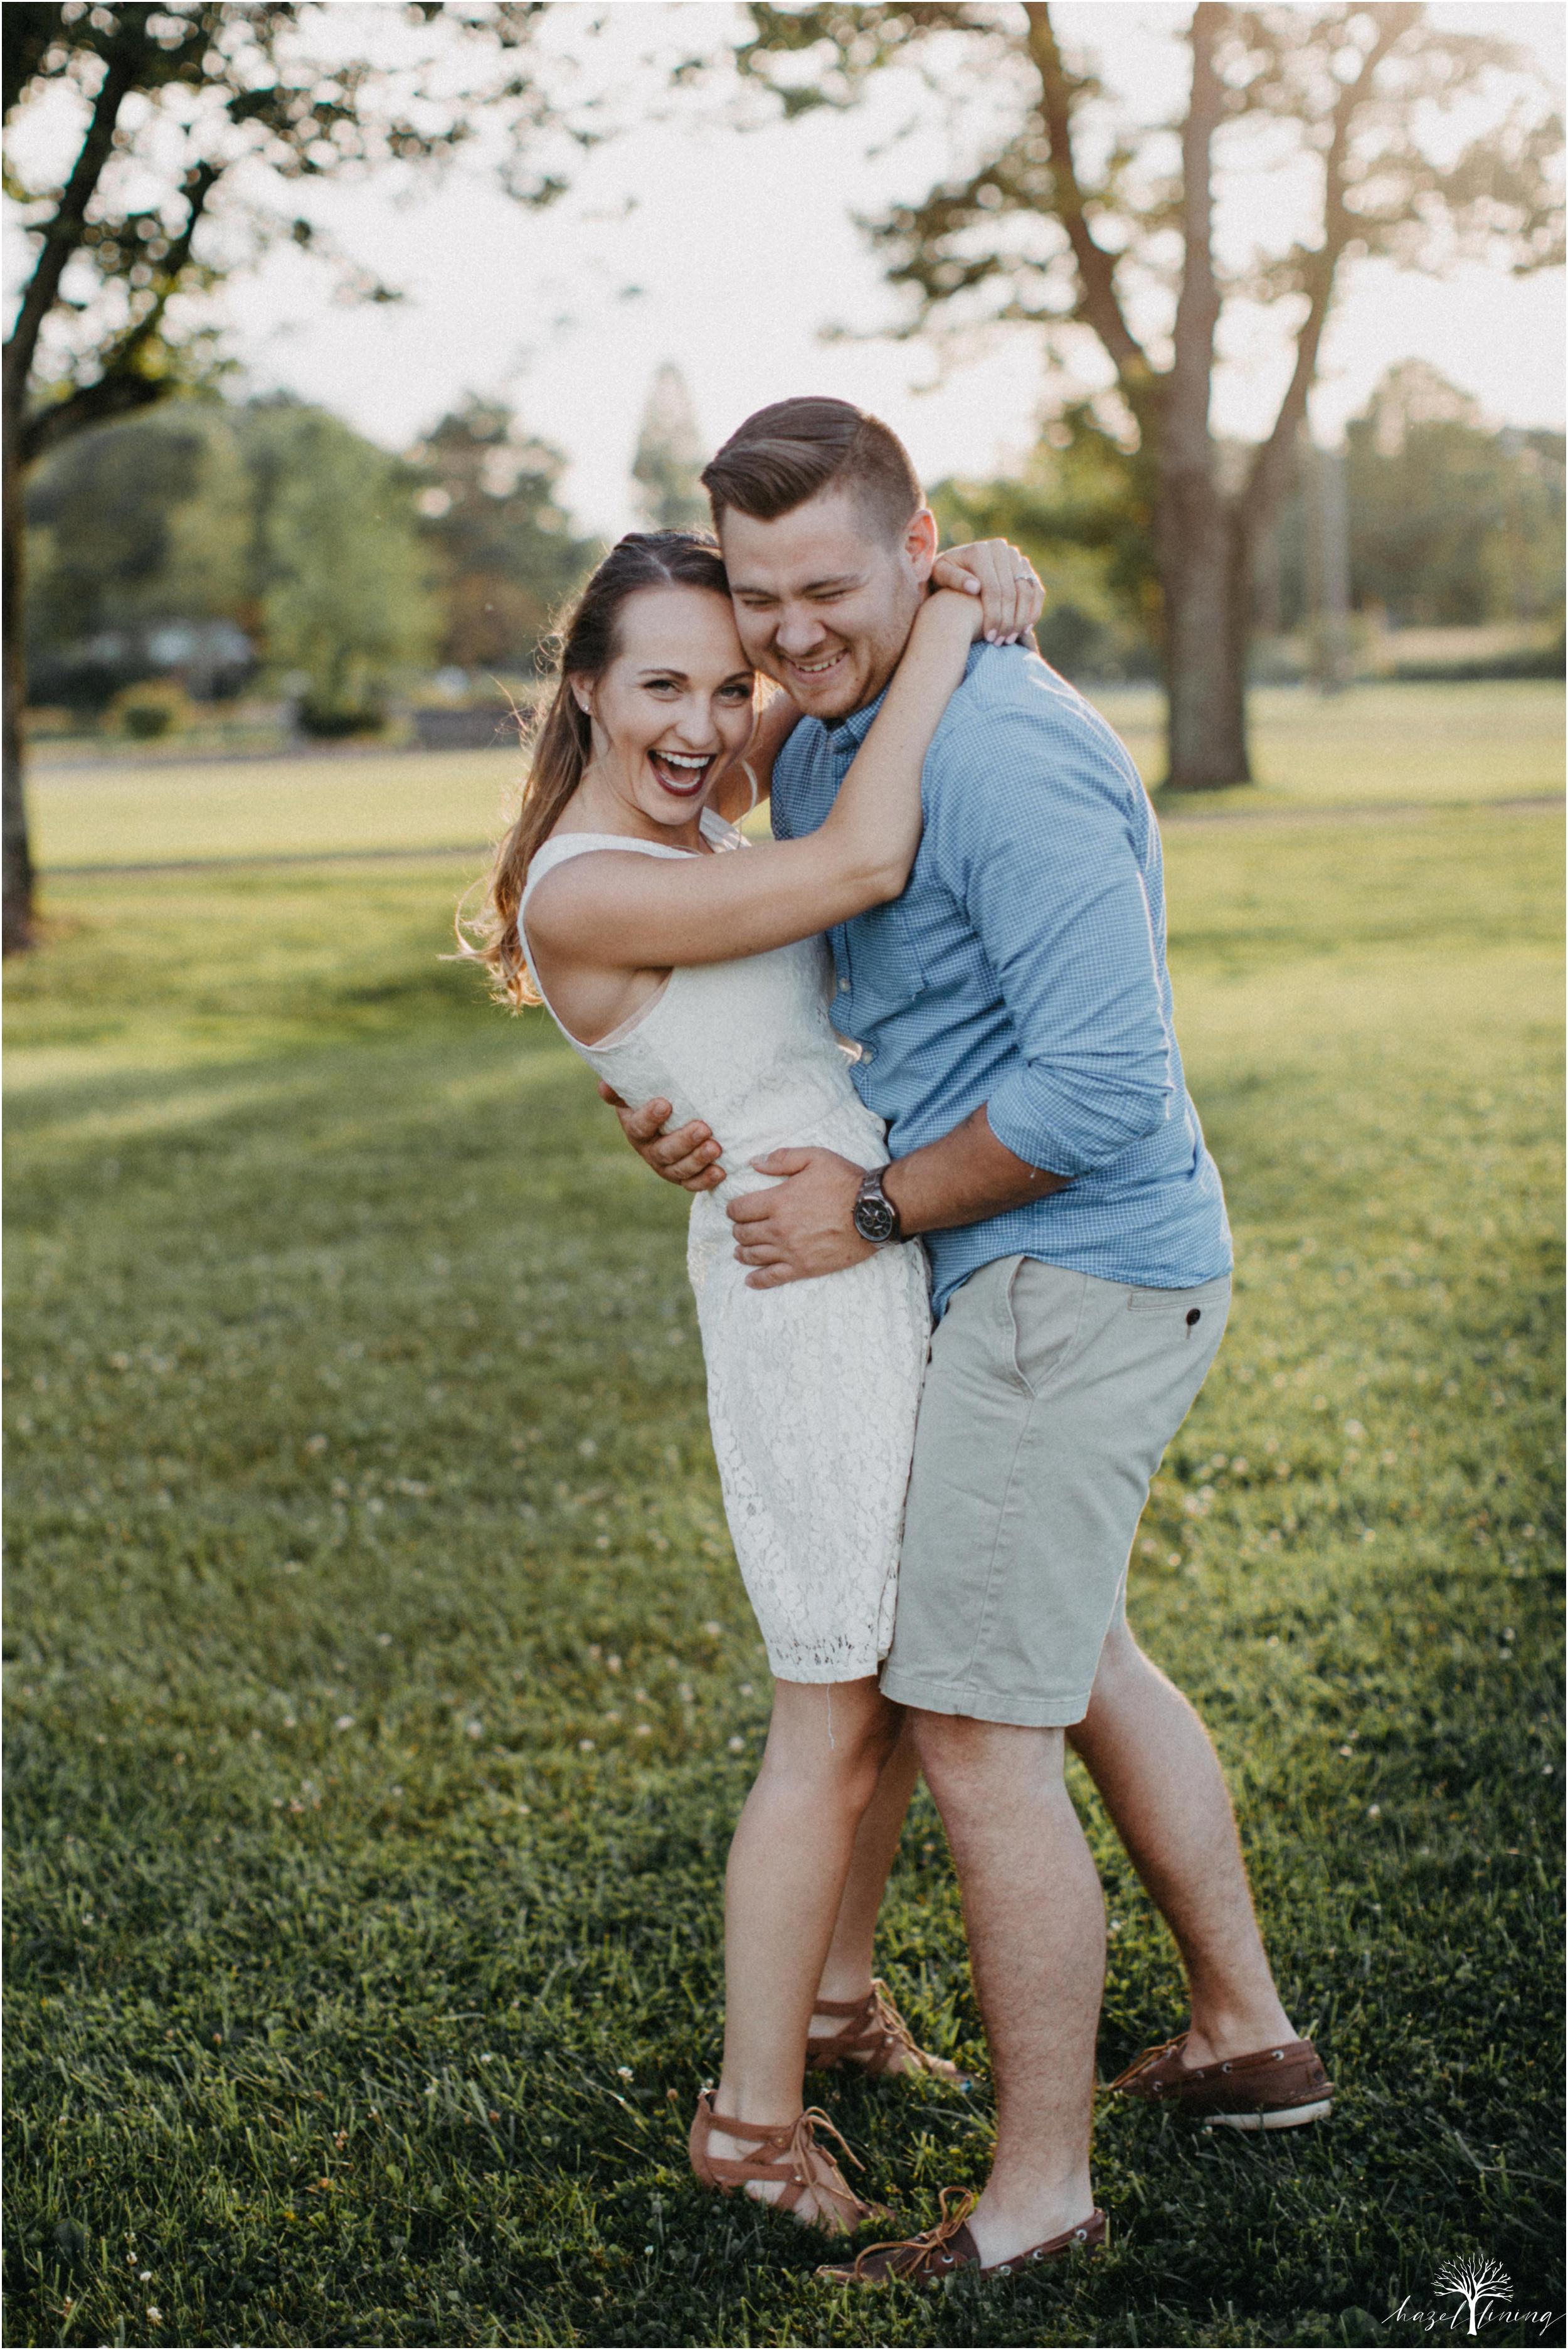 rachel-warner-chris-niedrist-the-farm-bakery-and-events-quakertown-pa-summer-engagement-hazel-lining-photography-destination-elopement-wedding-engagement-photography_0019.jpg